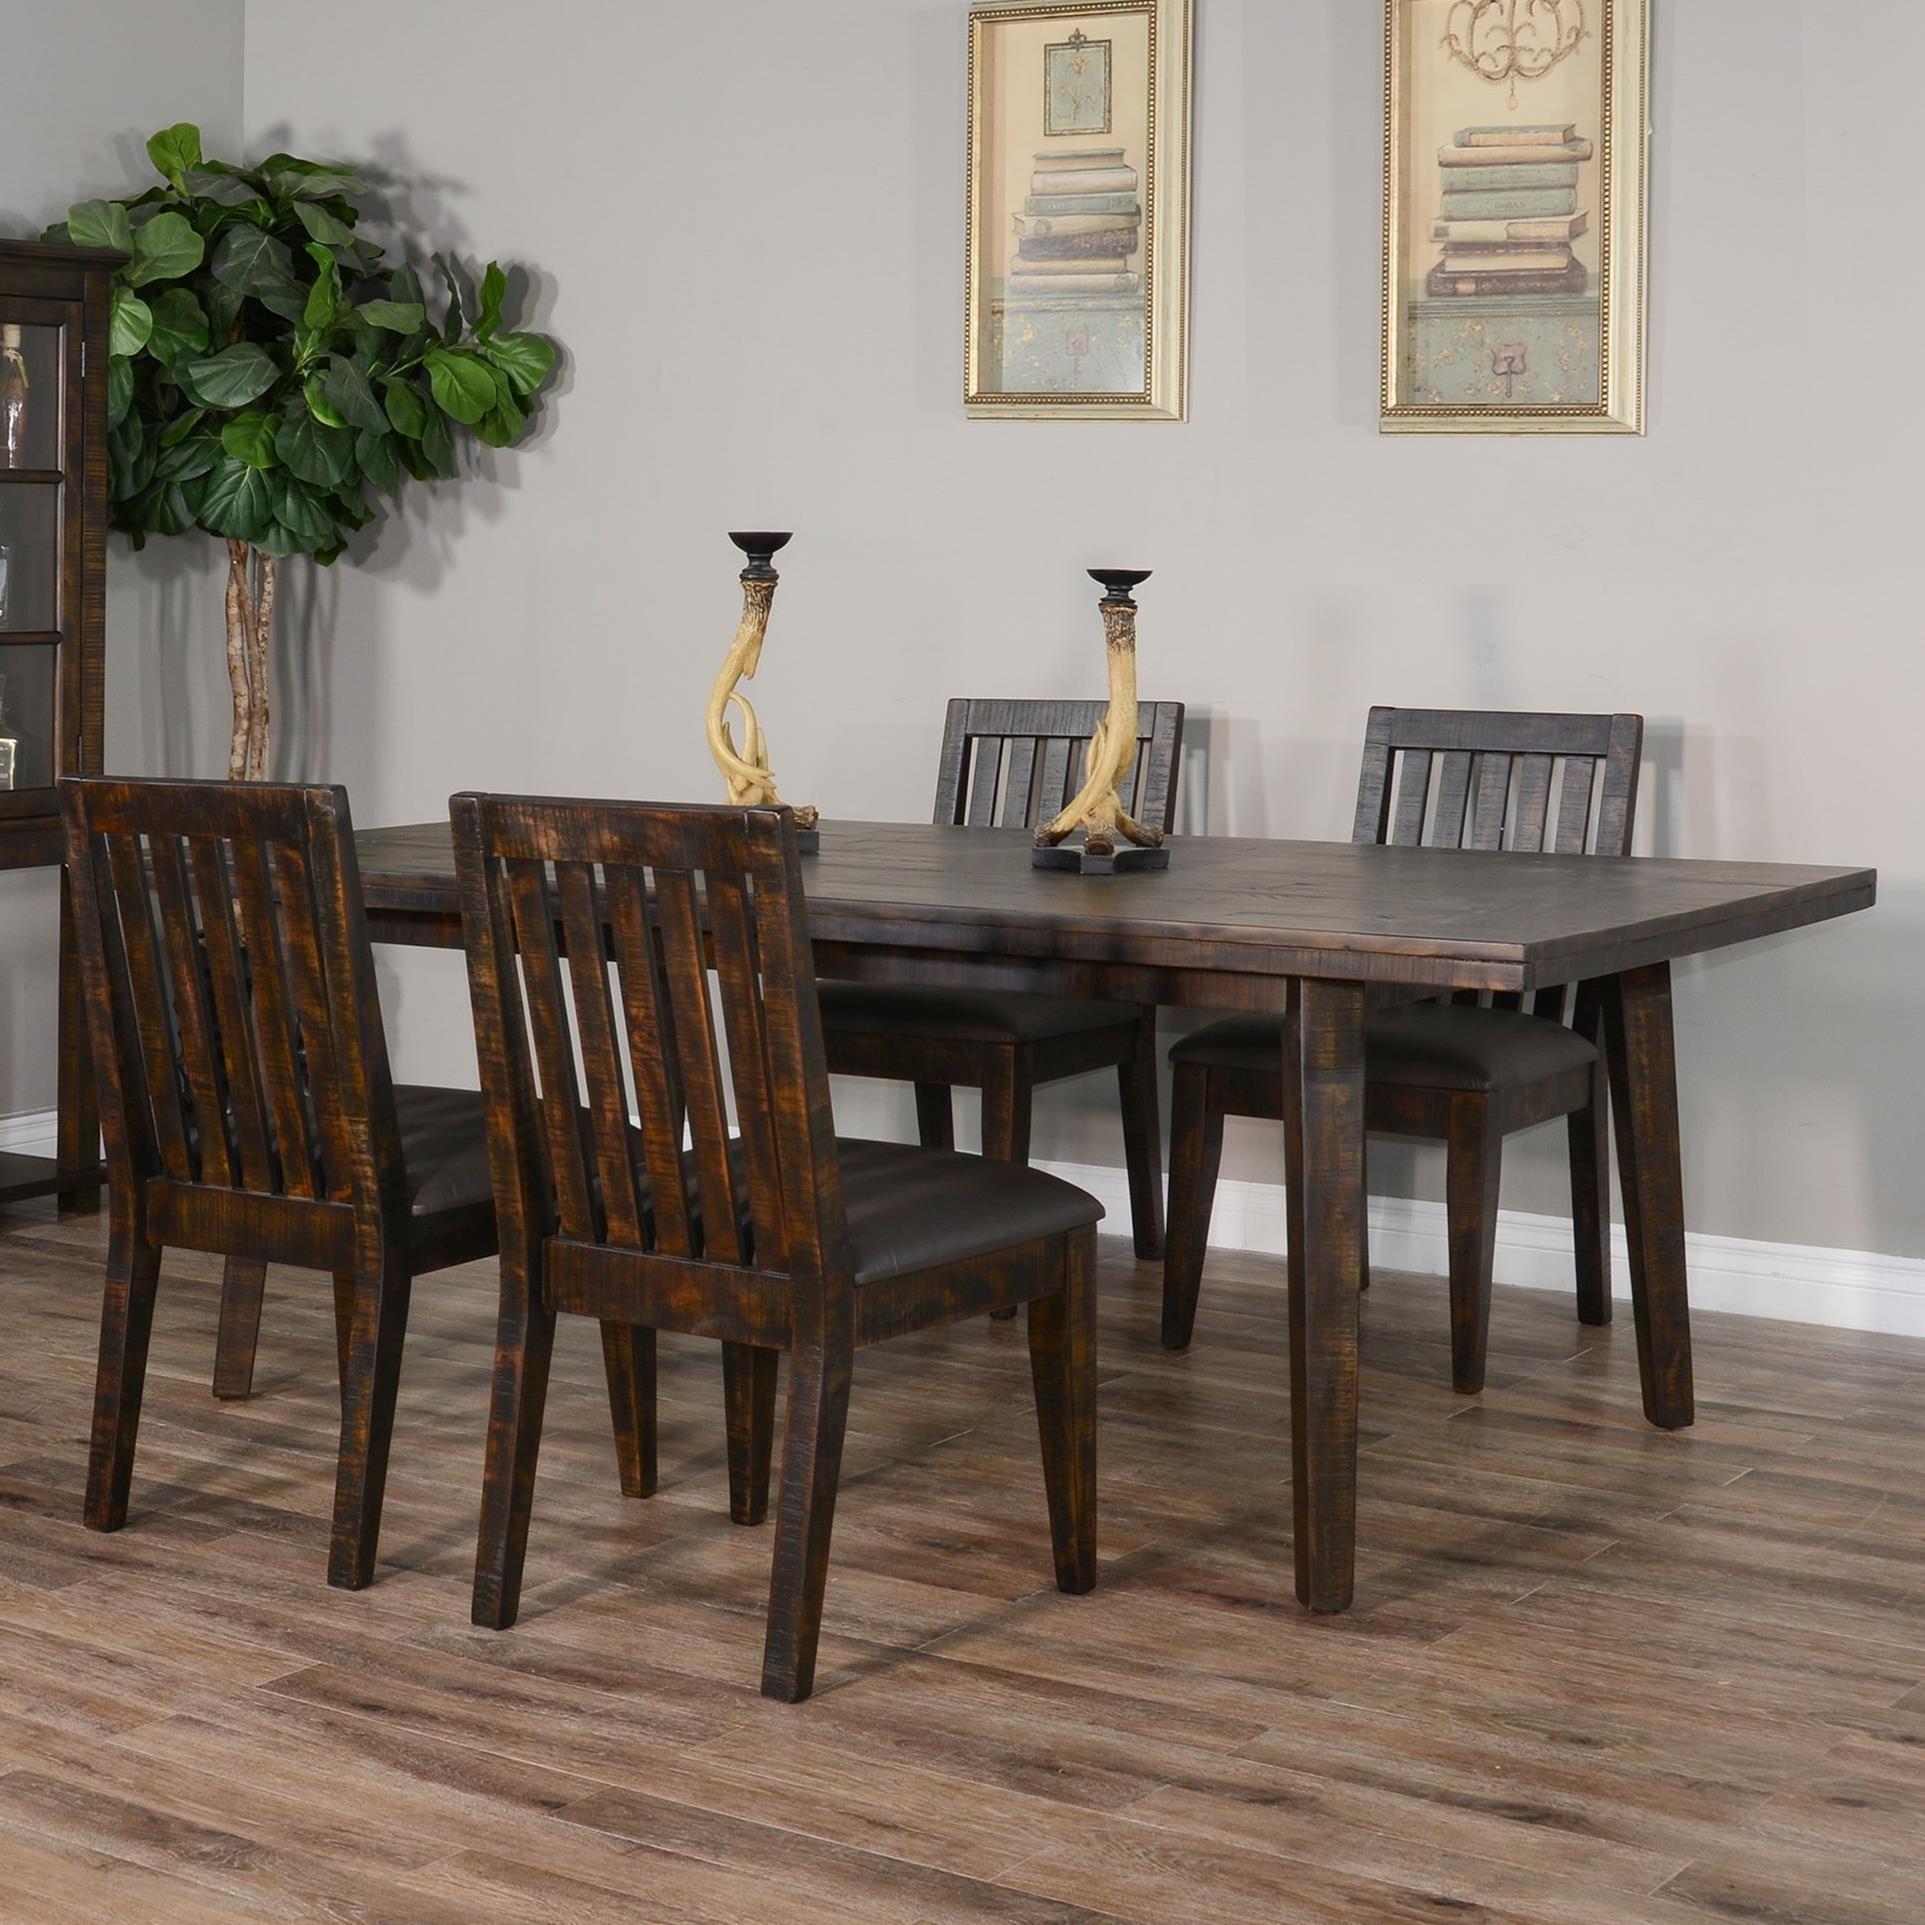 Nassau 5-Piece Table Set at Sadler's Home Furnishings